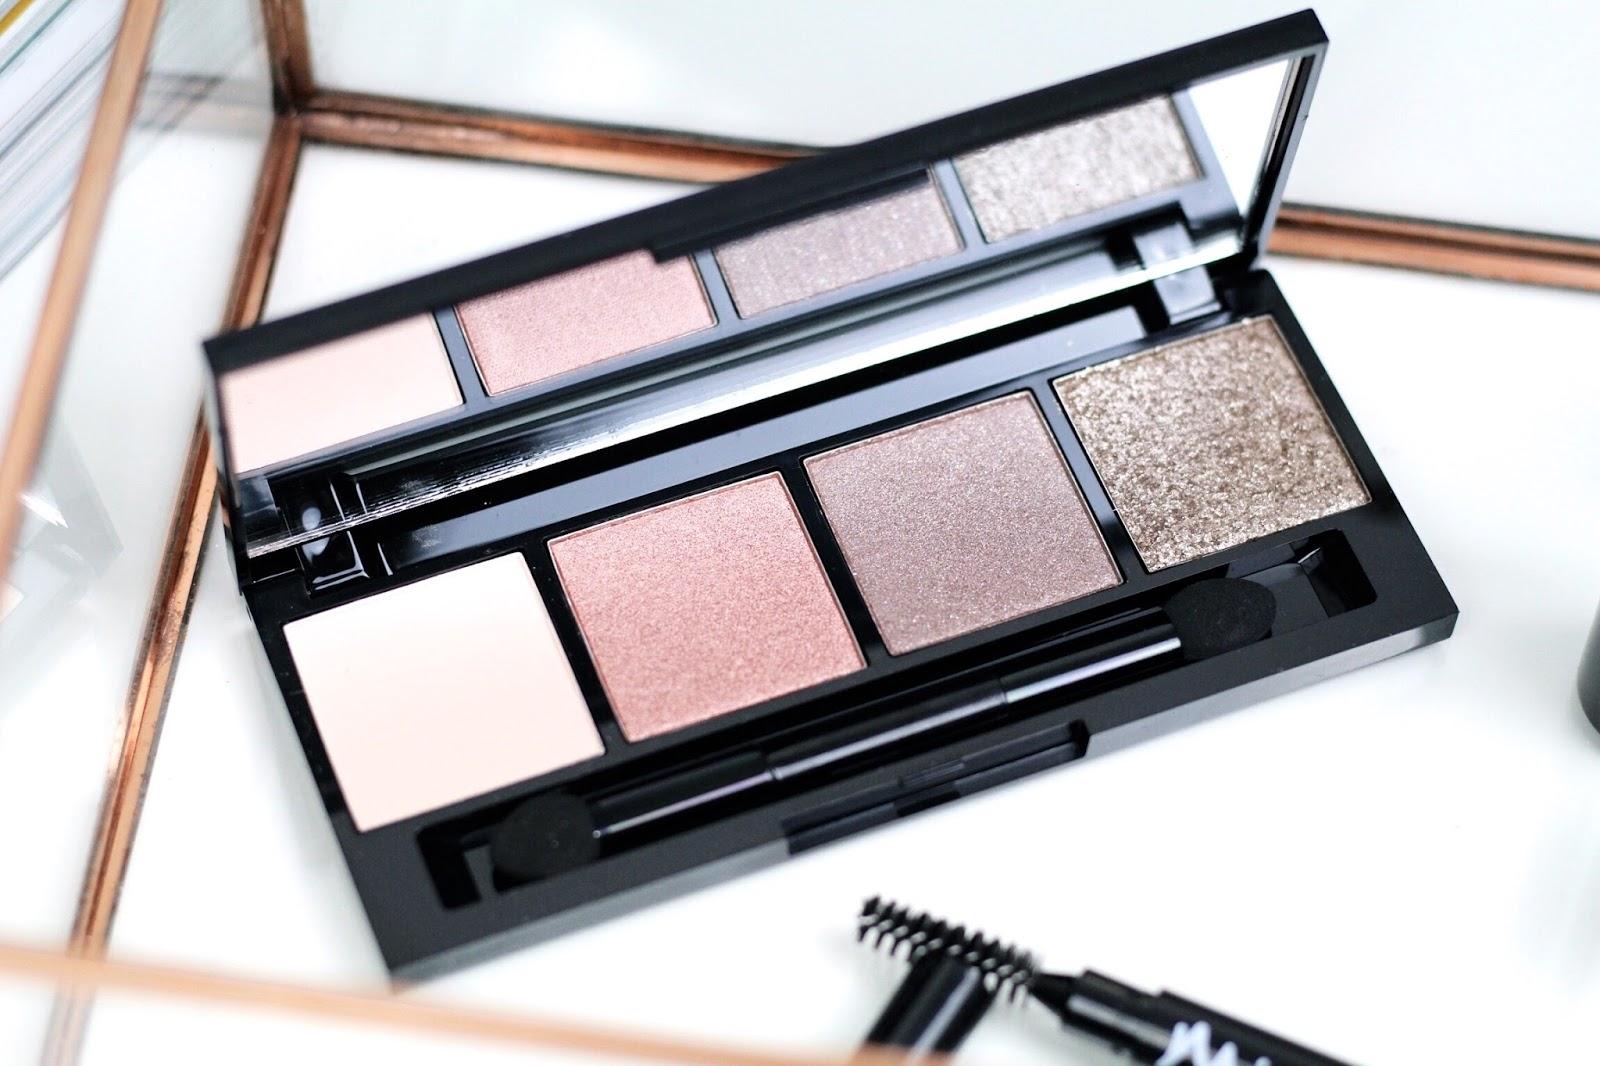 Mii Cosmetics Couture Eye Colour Compact